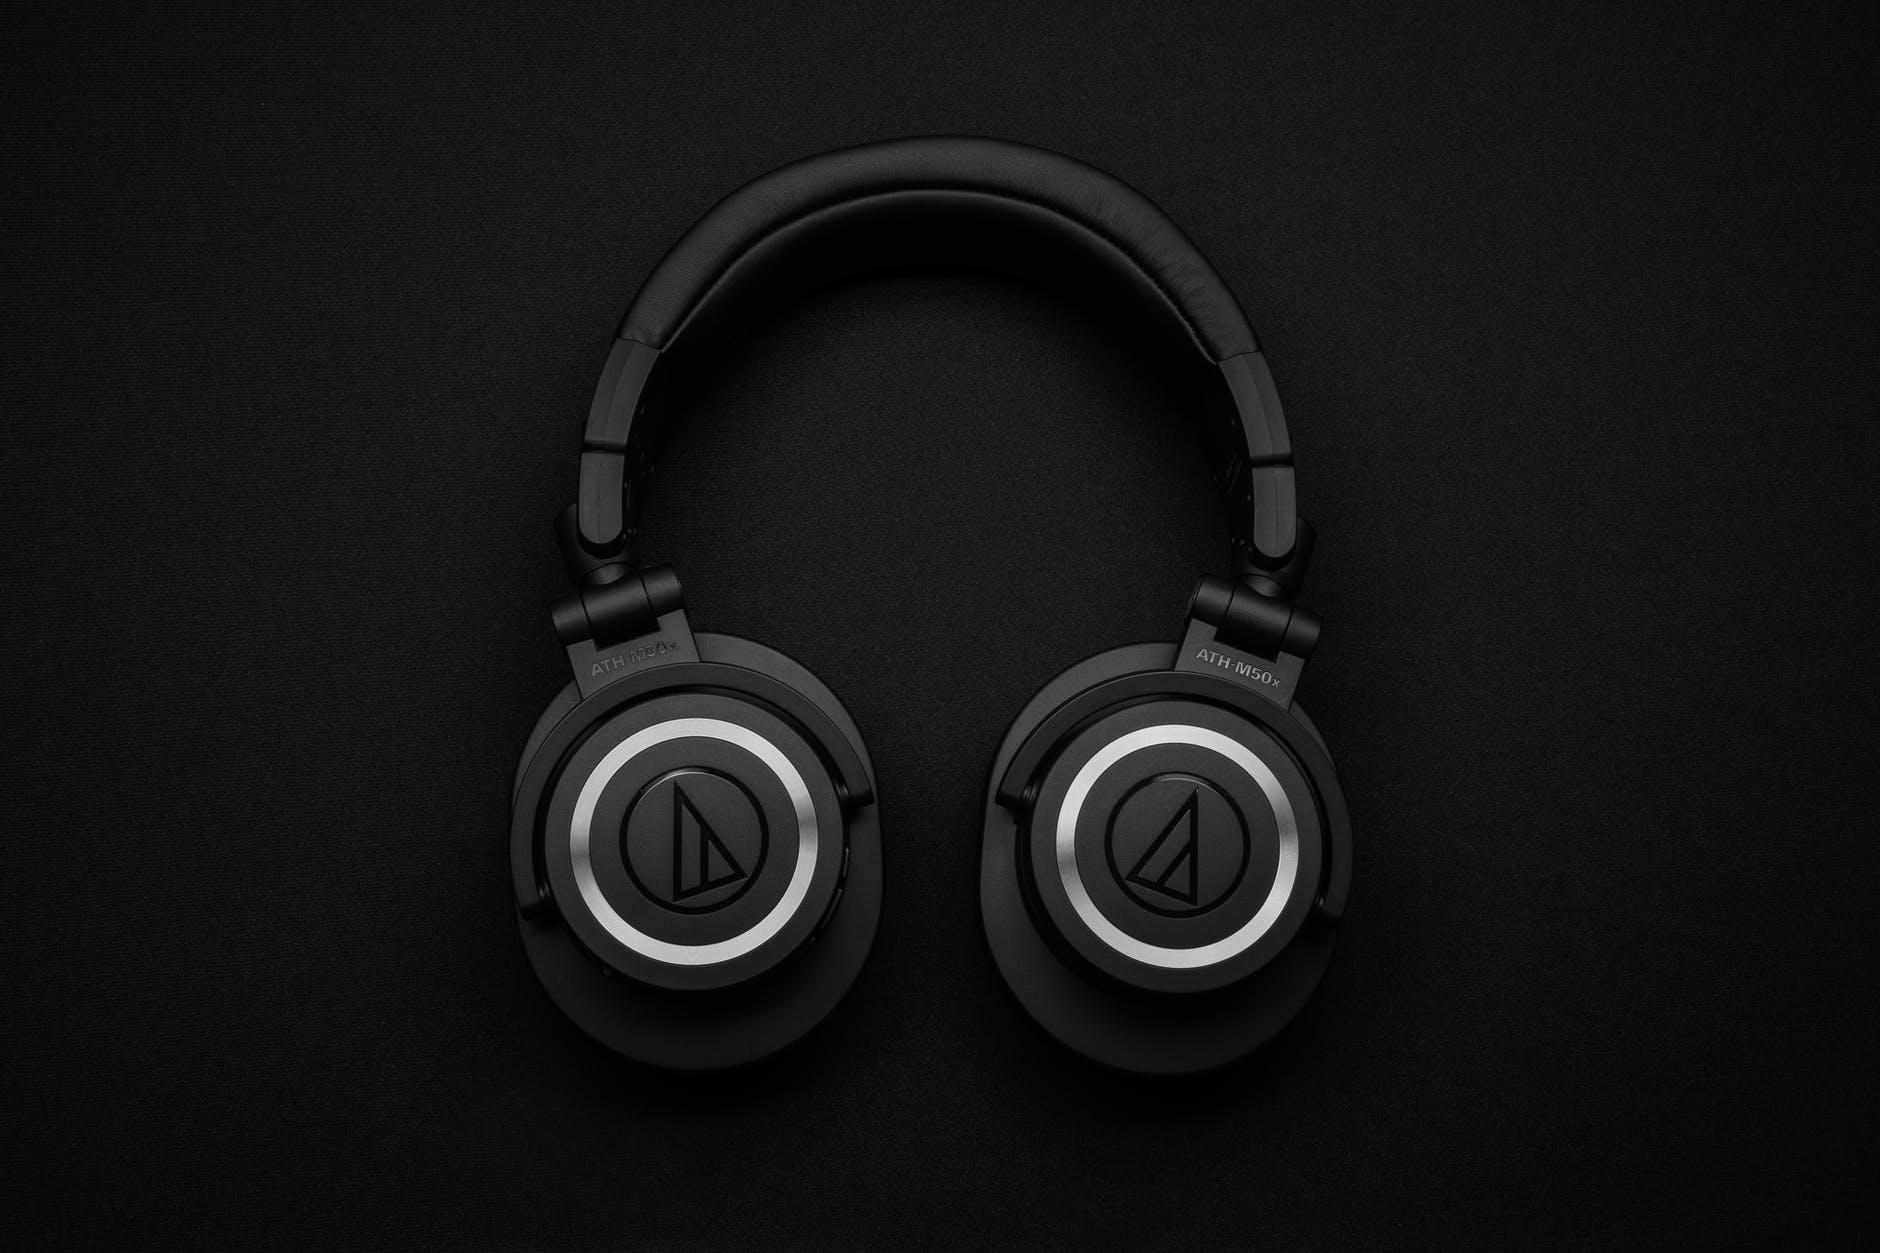 top view photo of black wireless headphones